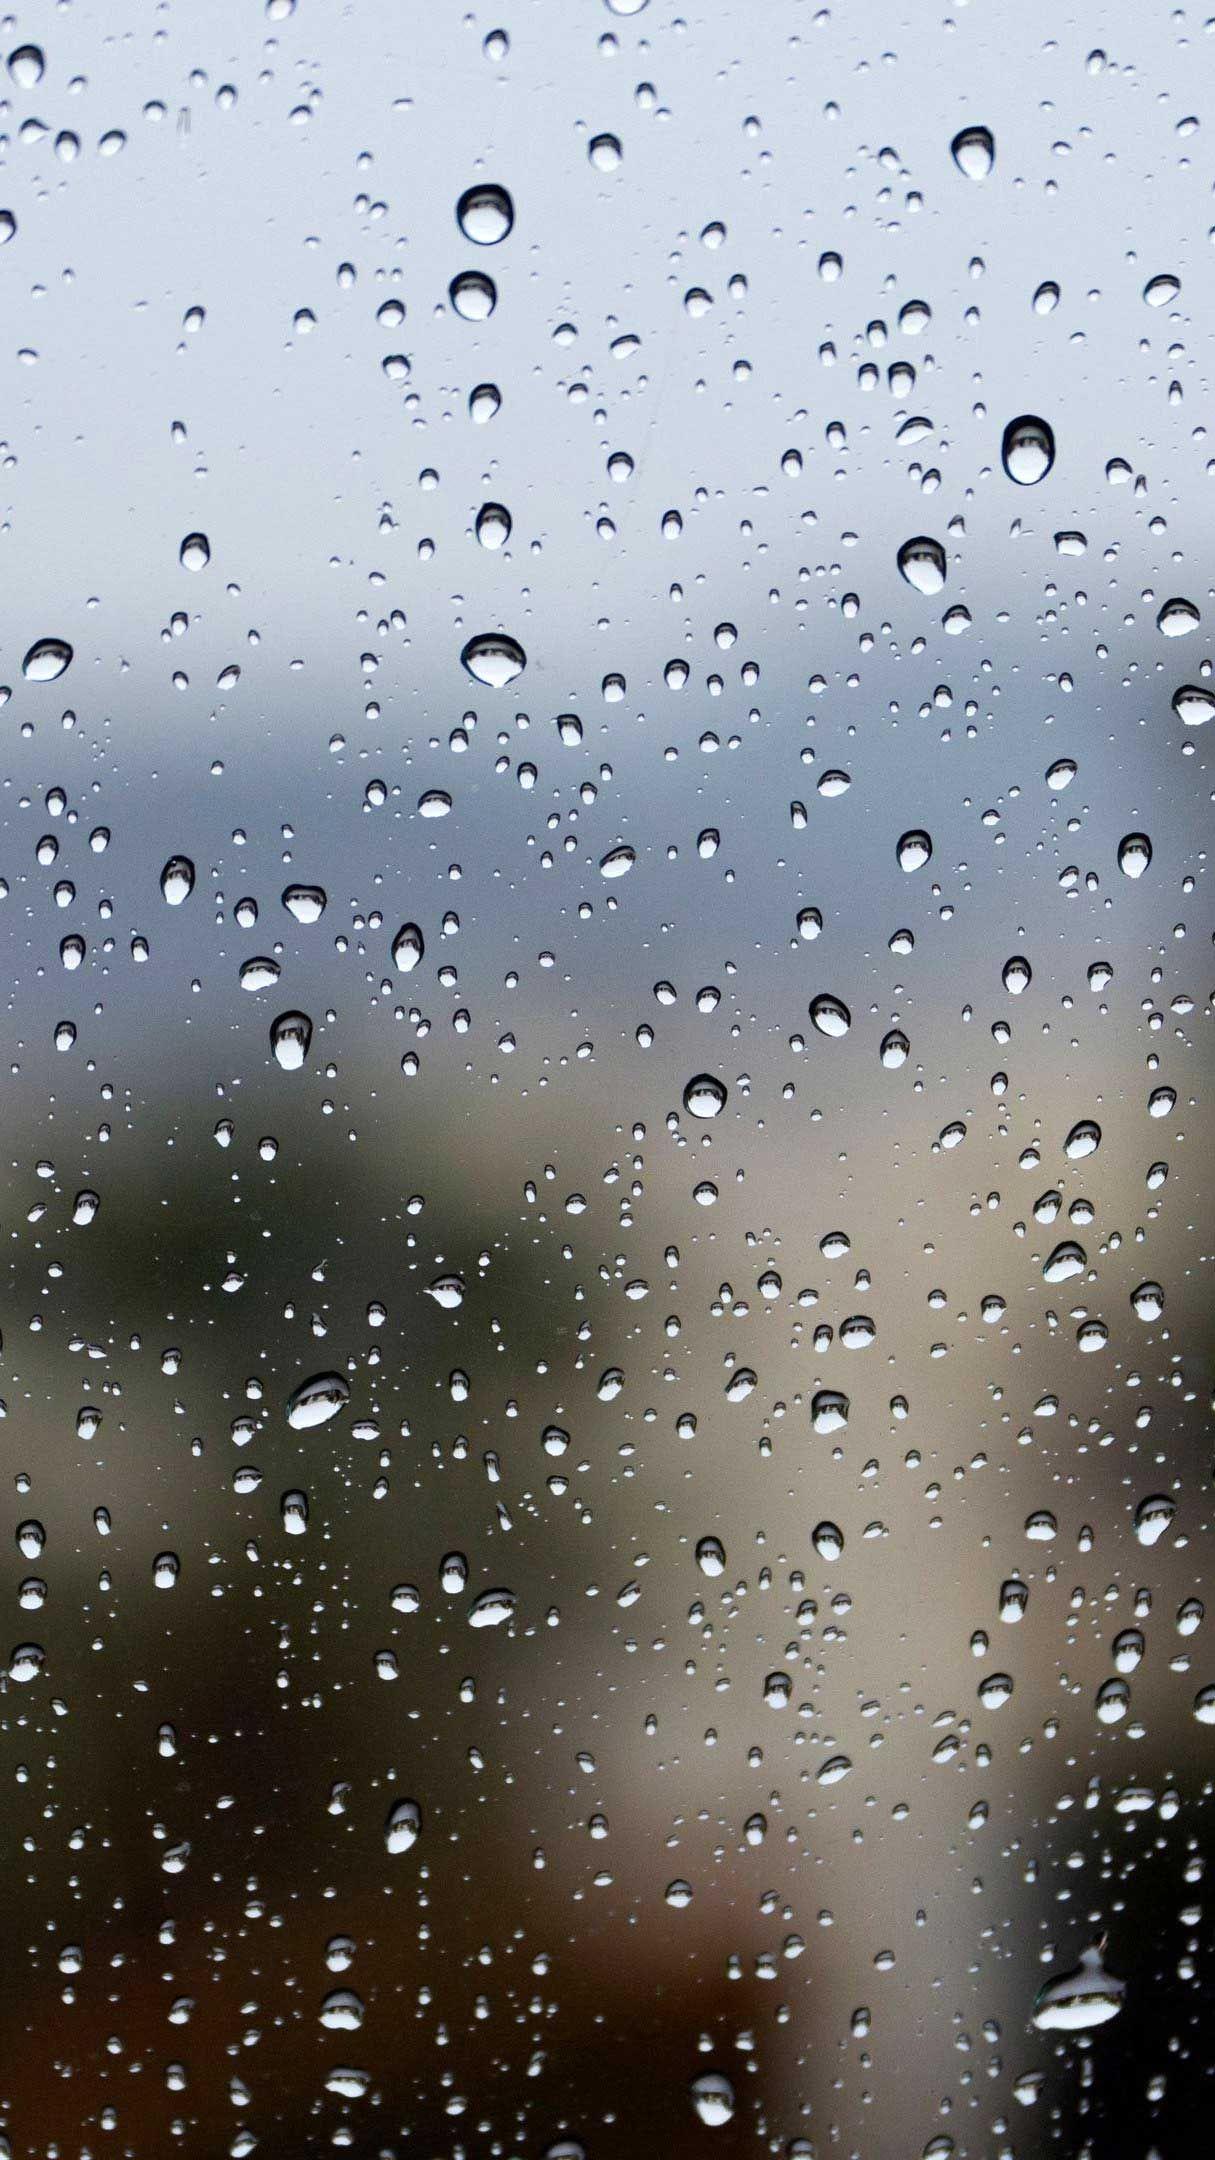 Drops Glass Rain Iphone Wallpapers Hd Rain Wallpapers Iphone Wallpaper Rainy Wallpaper